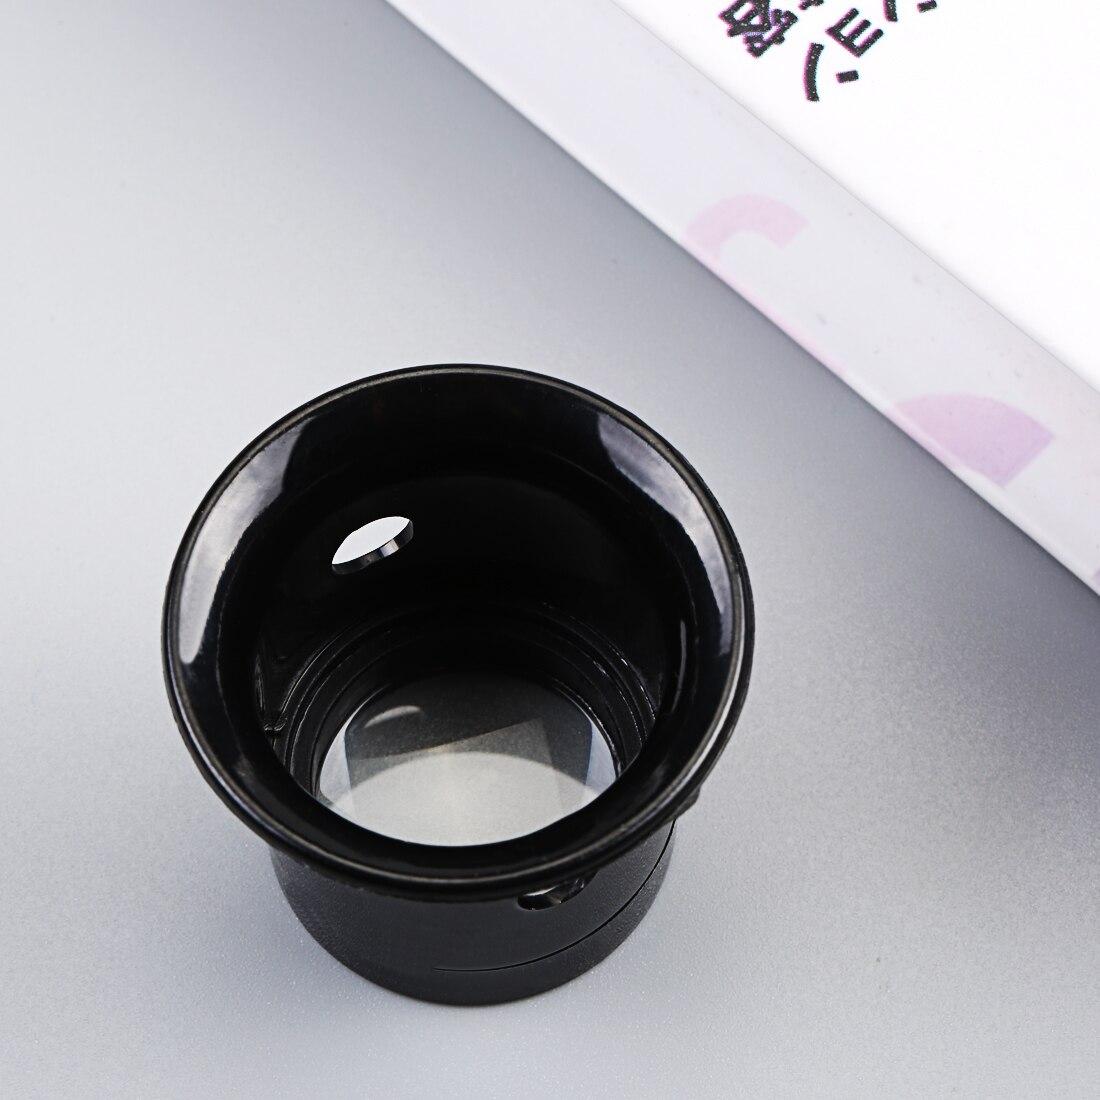 HTB1GTOotbGYBuNjy0Foq6AiBFXaU Jeweler Watch Magnifier Tool 10X/5X Monocular Magnifying Glass Loupe Lens Eye Magnifier Len Repair Kit Tool